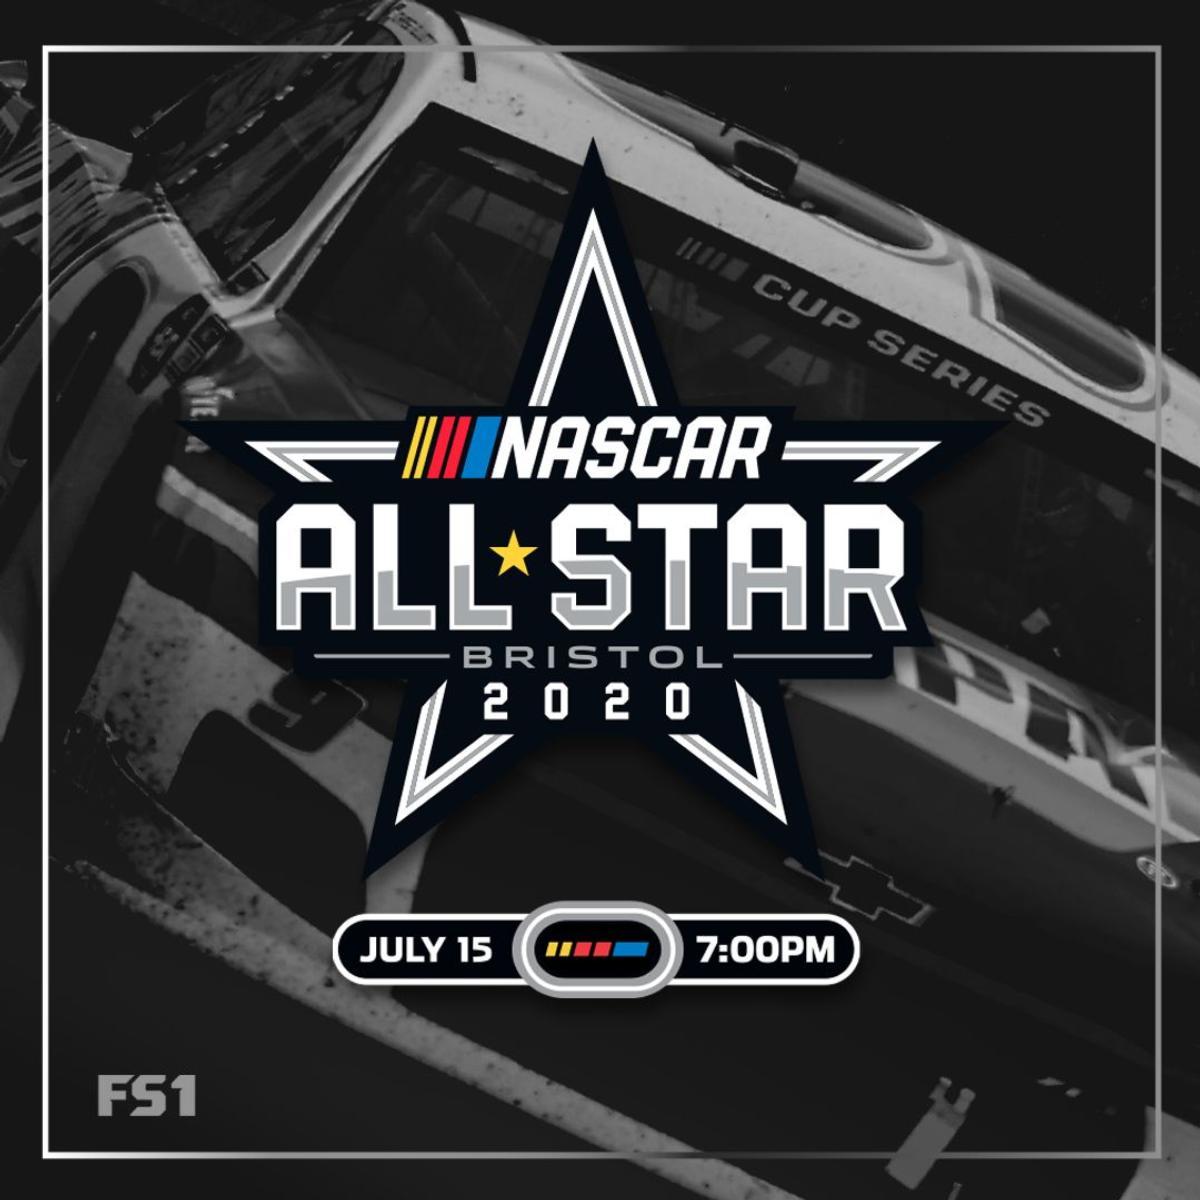 Bristol Motor Speedway Christmas Lights 2020 2020 NASCAR All Star Race Moves to Bristol Motor Speedway | News